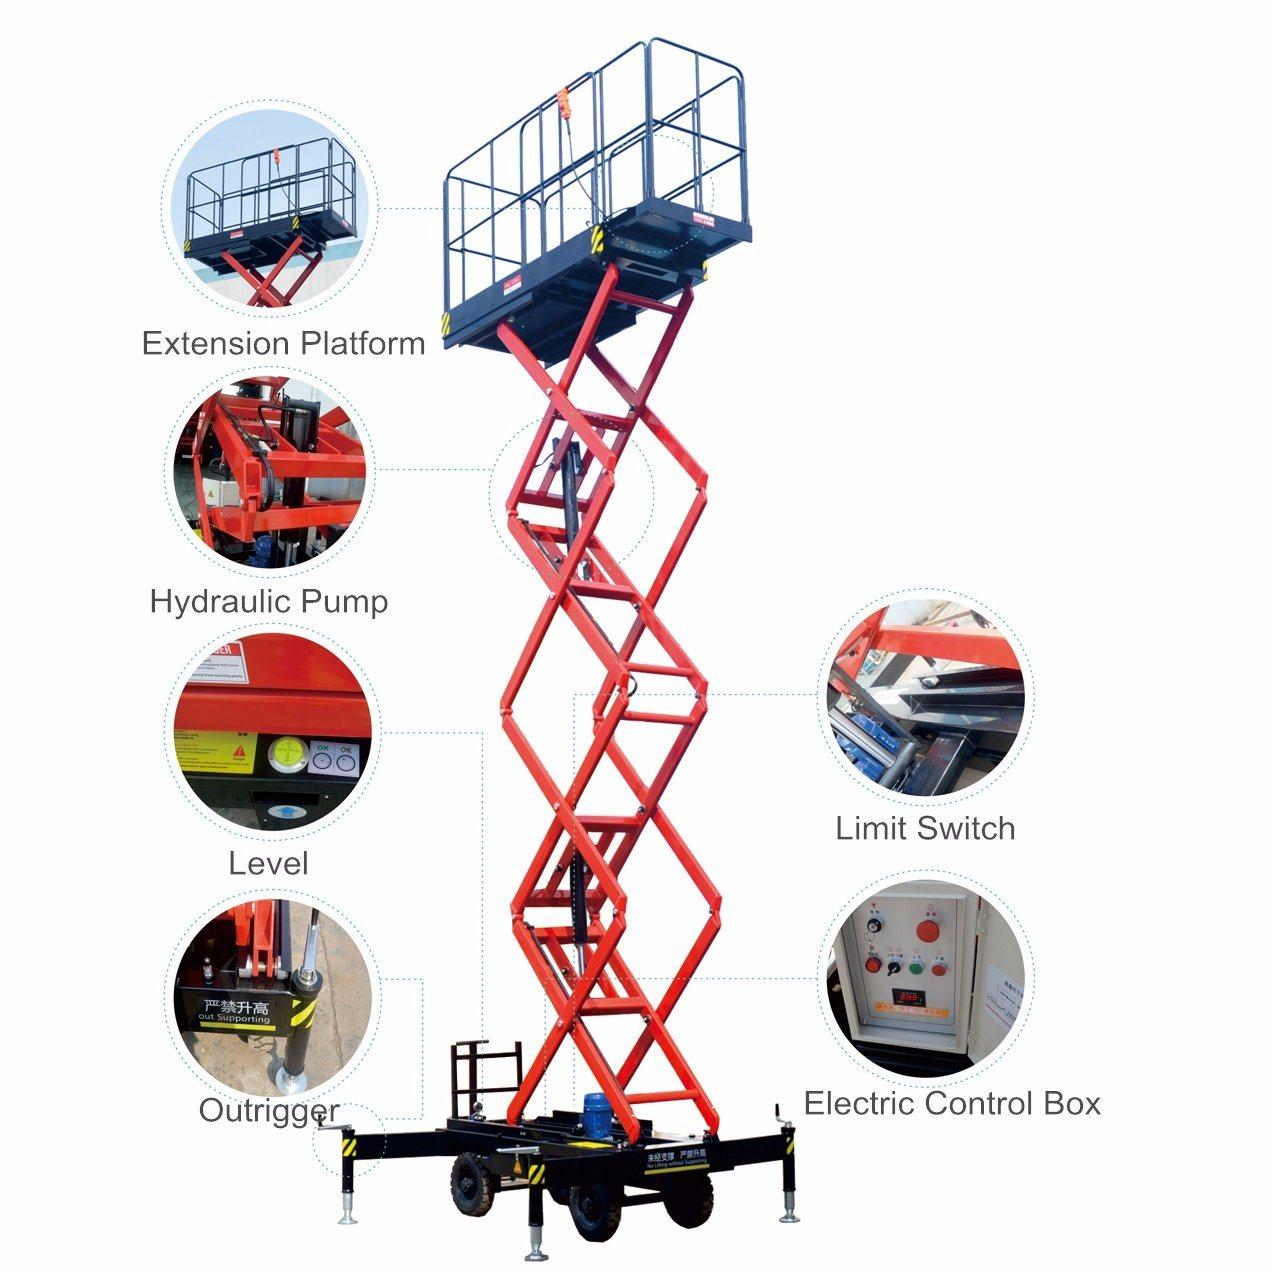 11m Manganese Steel Mobile Scissor Lift for Installlation & Maintenance